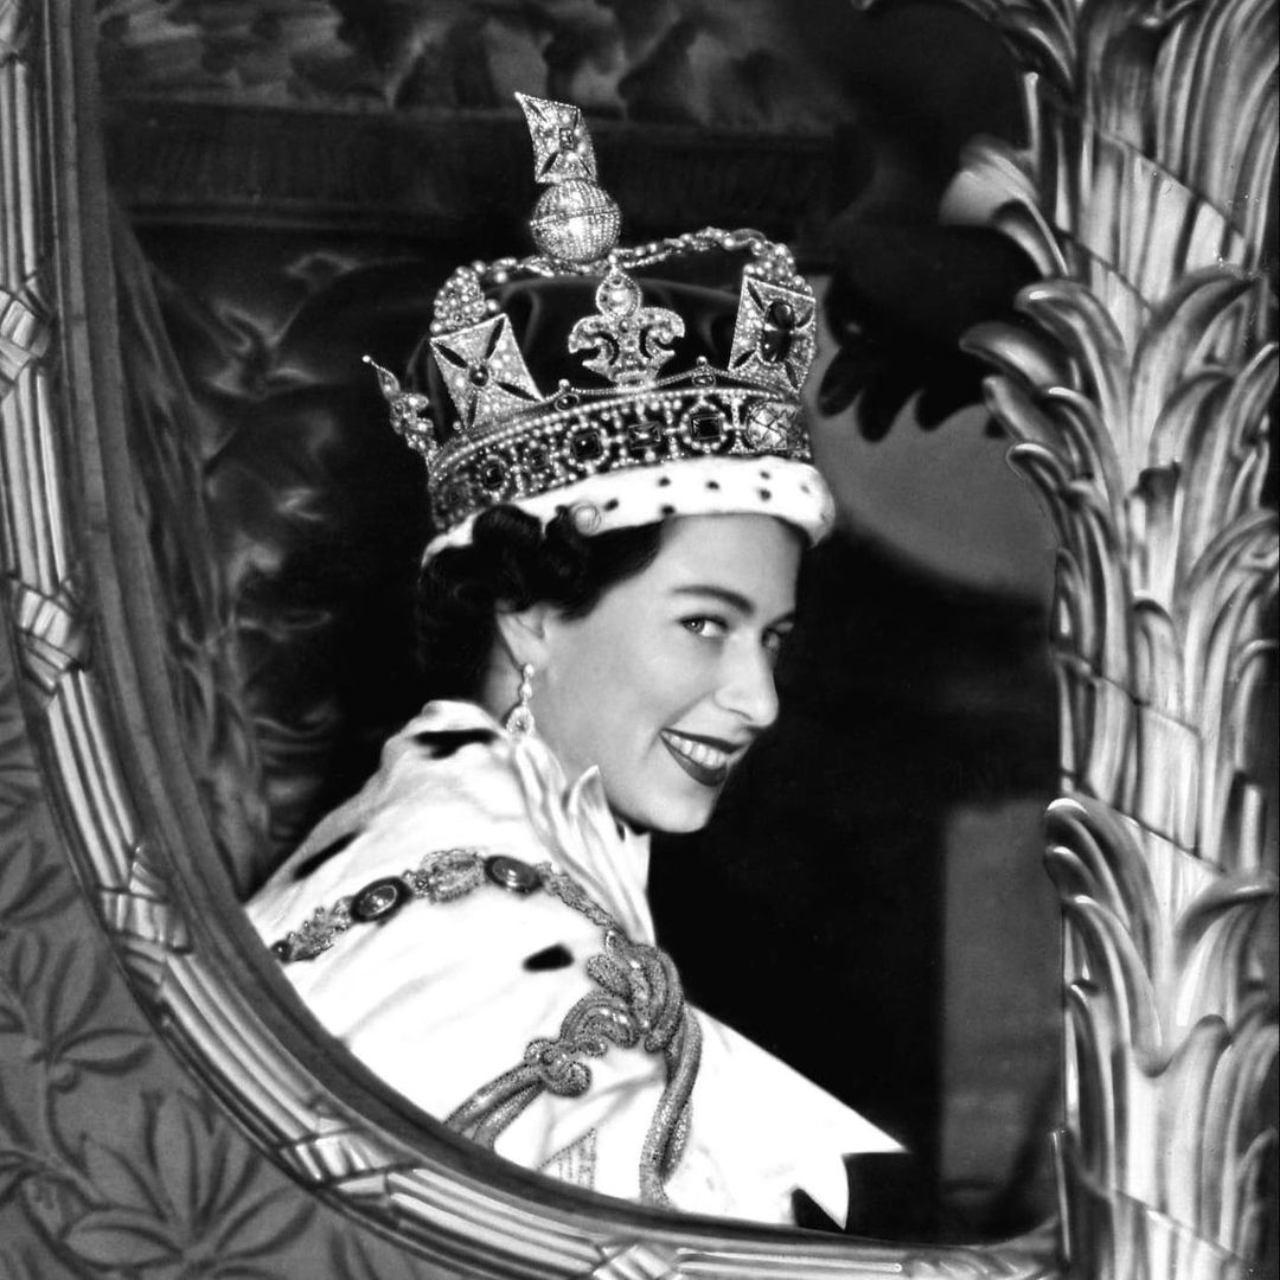 Reina Isabel desinvita Harry fiesta